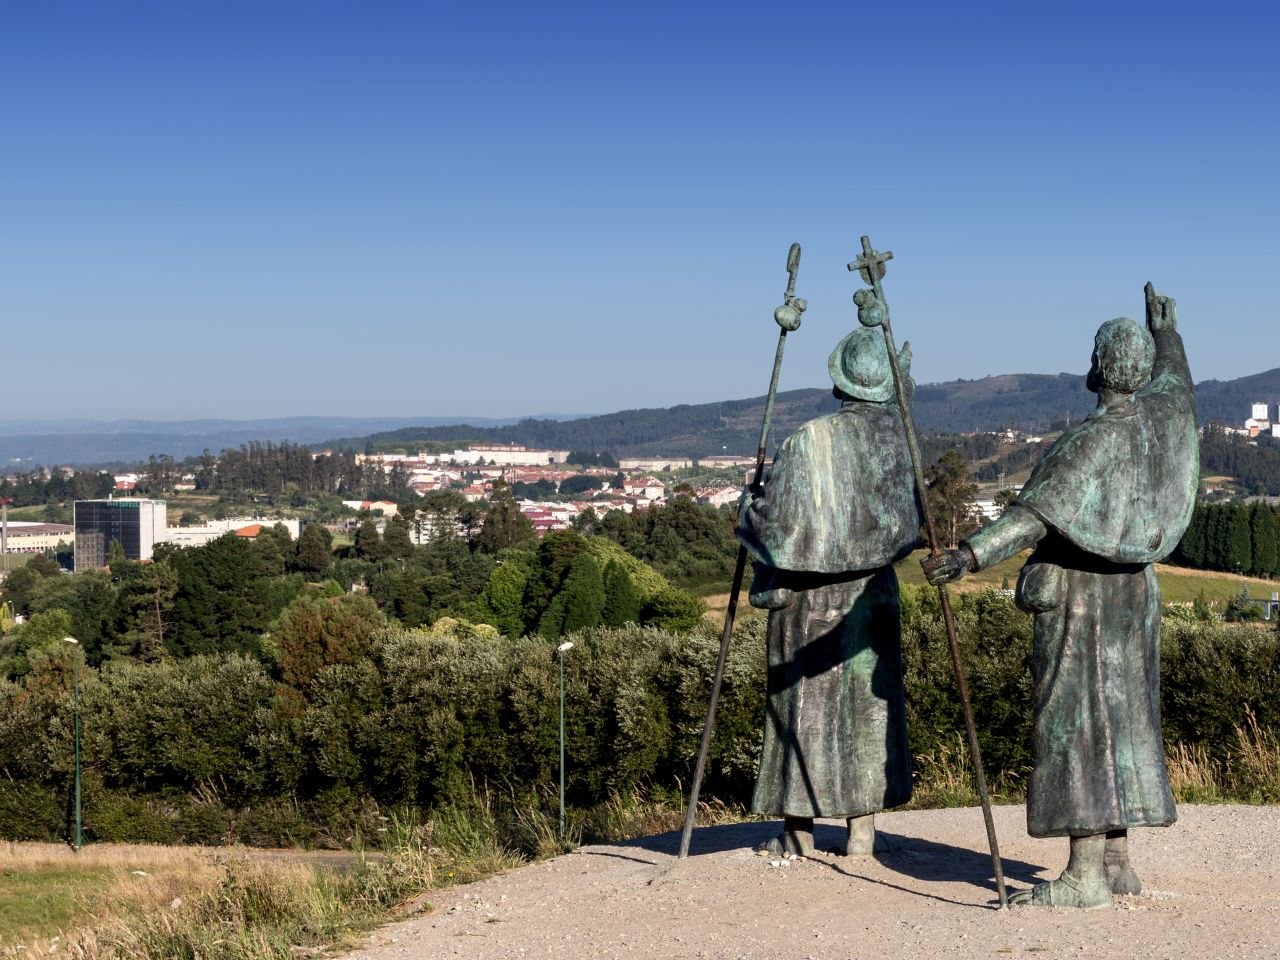 monte-do-gozo-statuen-erstmals-blick-auf-kathedrale-von-santiago-de-compostela-maartenhoek-fotolia-x